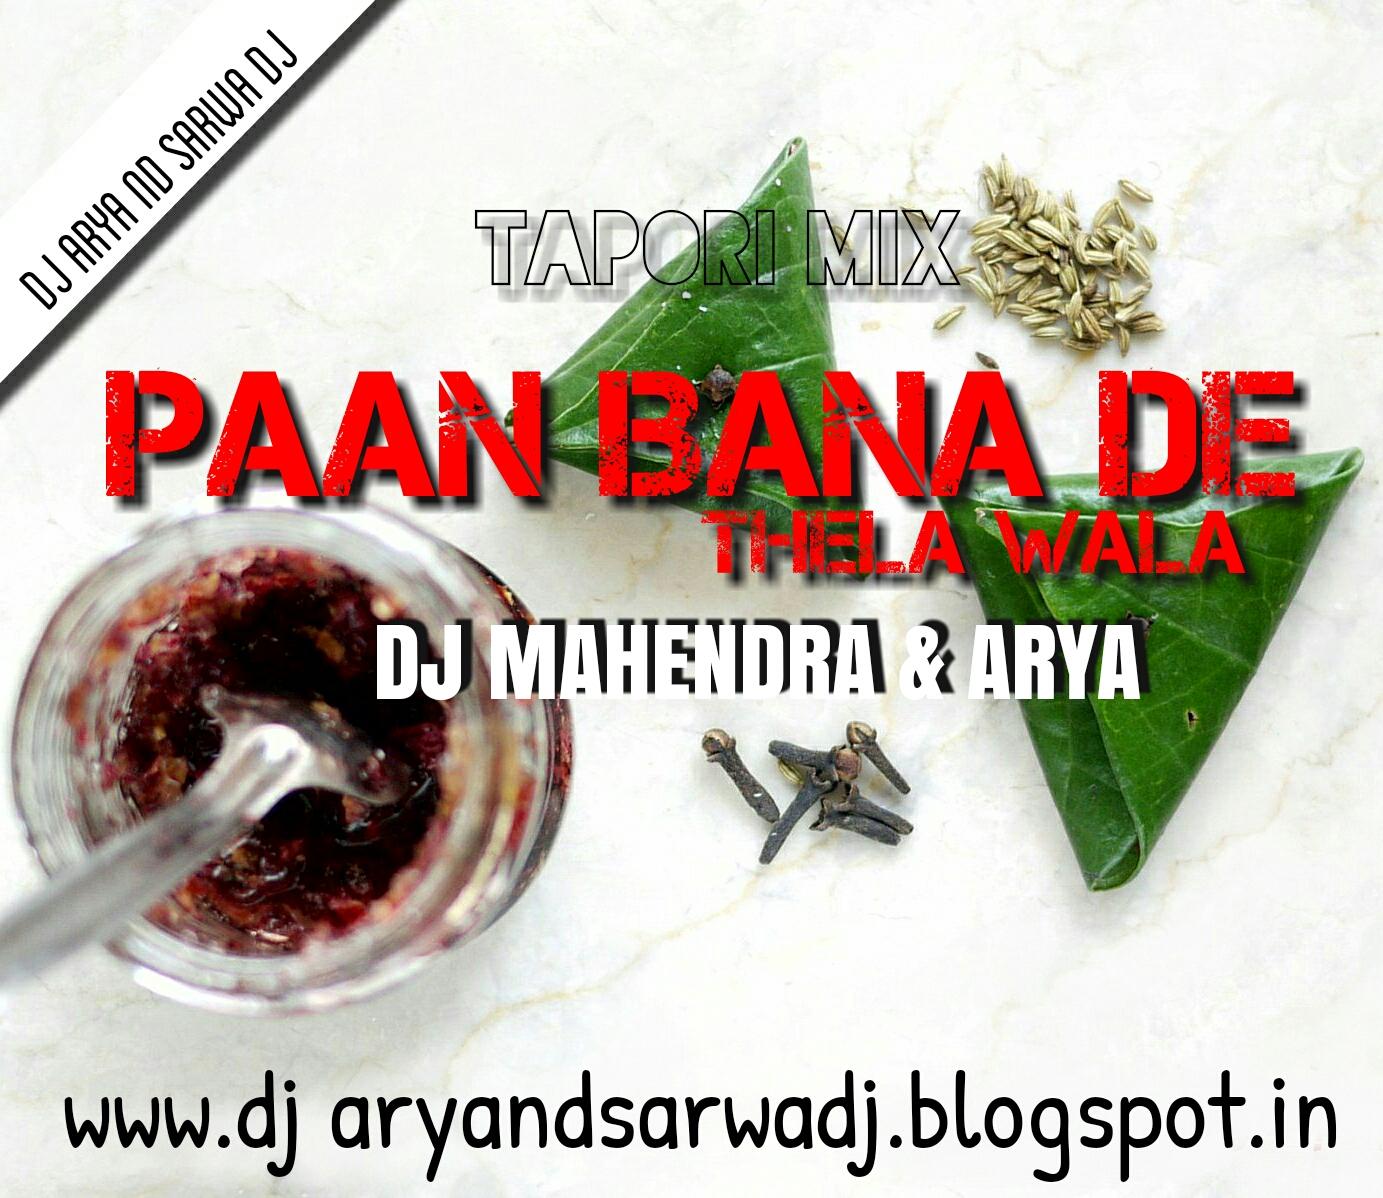 PAAN BANADE THELA WALA _(TAPORI MIX)_DJ MAHENDRA & DJ ARYA